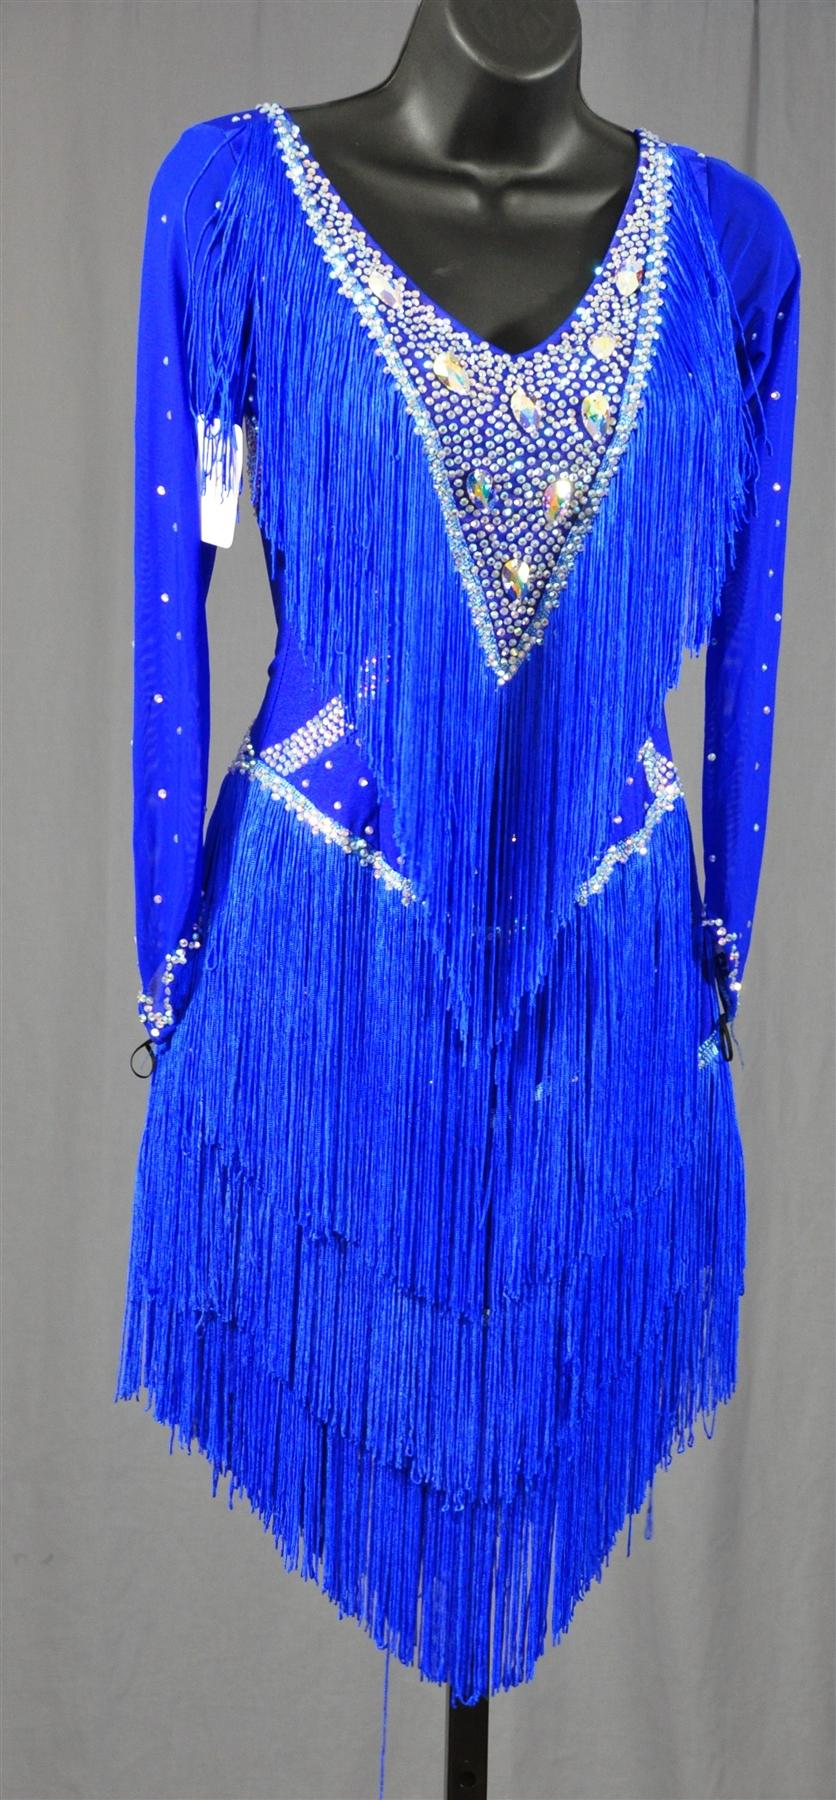 Fringe Dresses With Sleeves